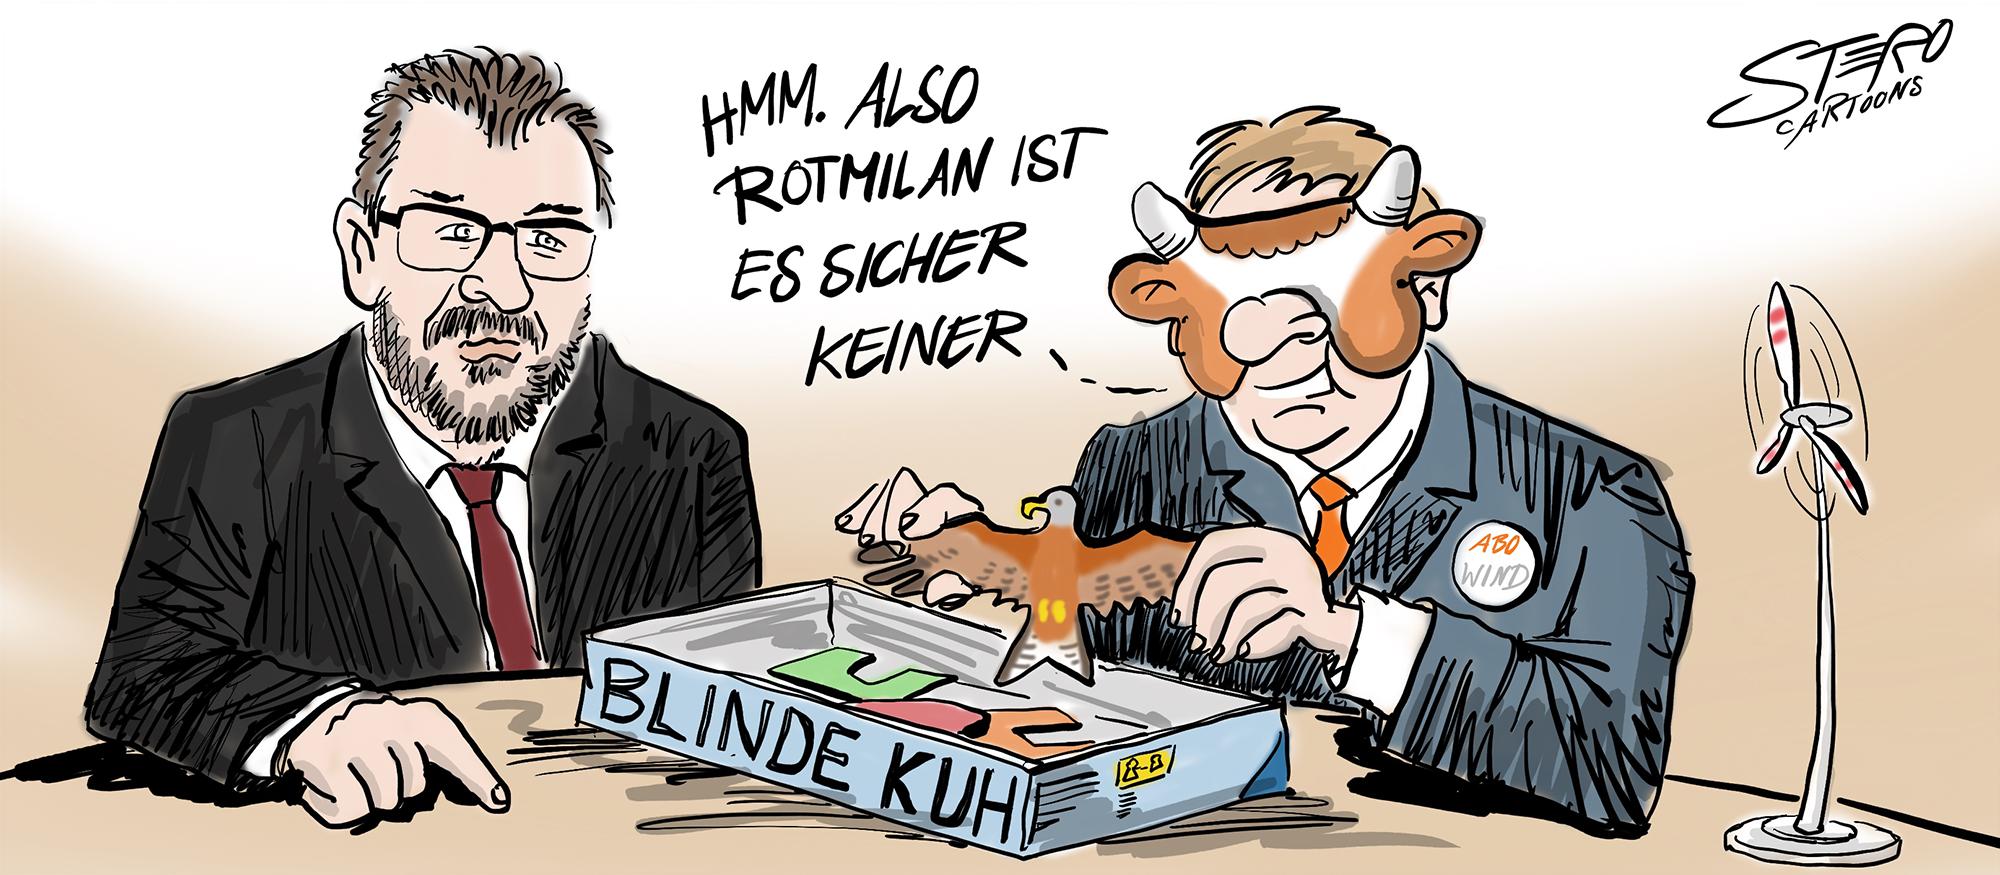 Cartoon-Karikatur Blinde Kuh Windkraft